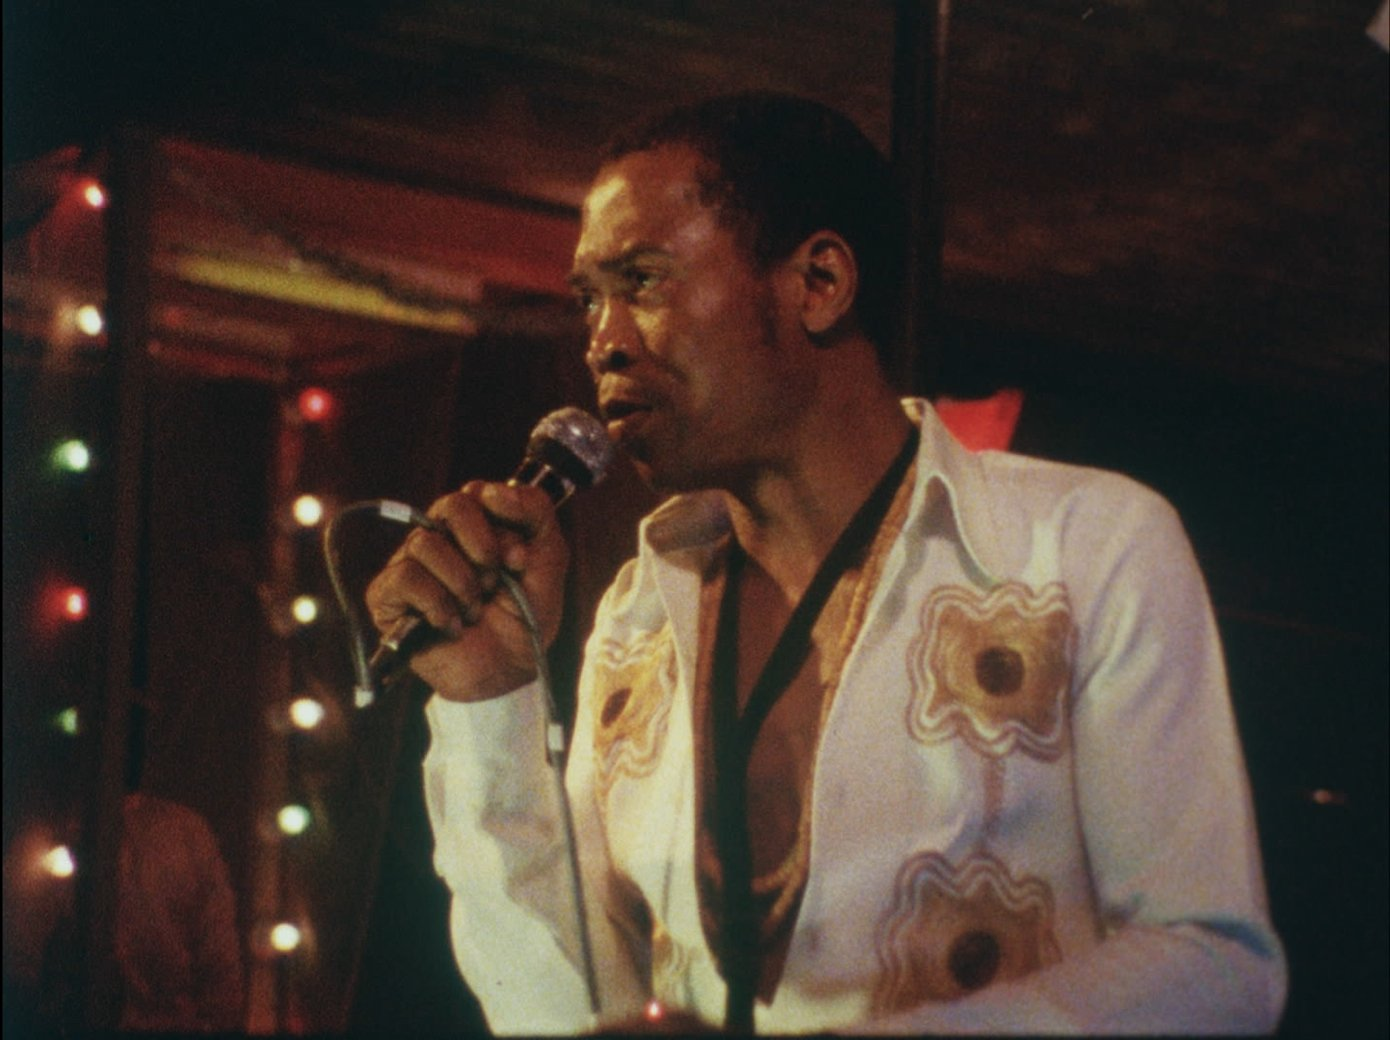 Finding Fela: Fela Kuti in un'immagine del documentario